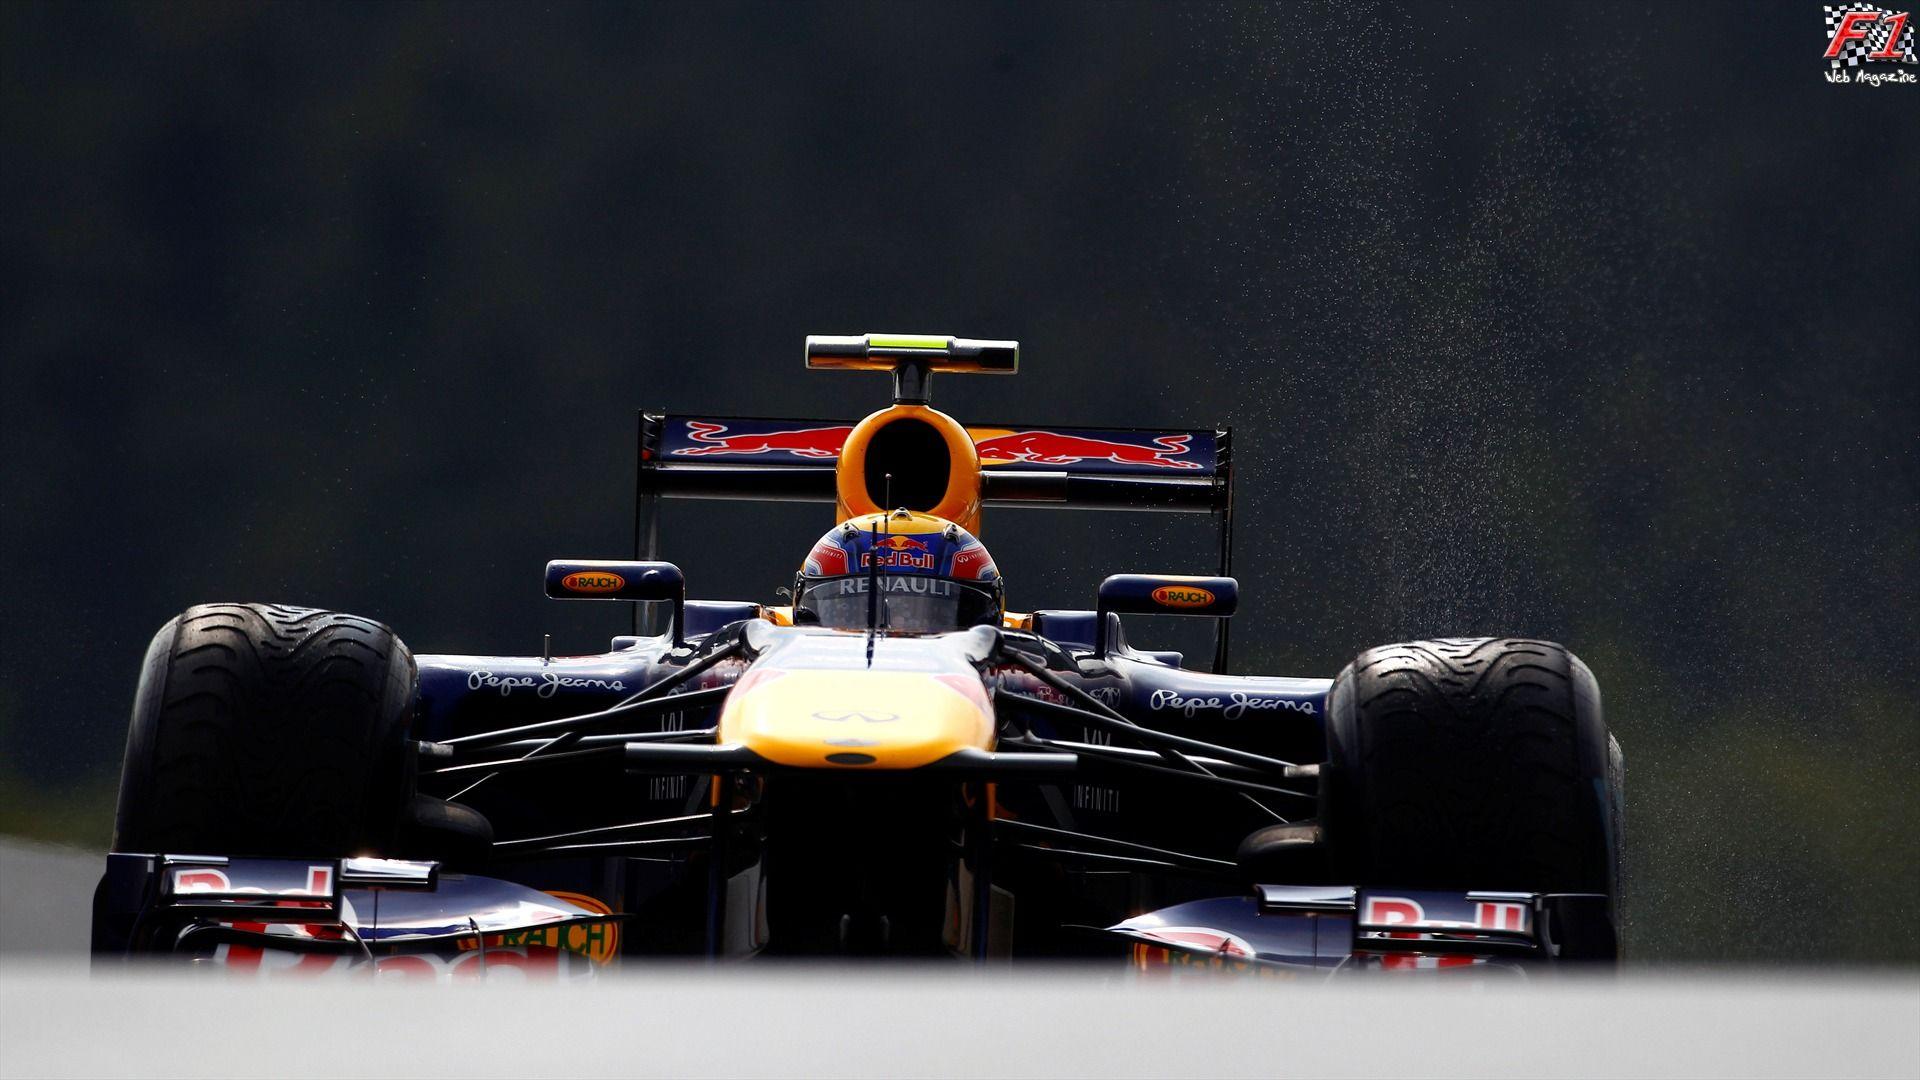 GP Belgio - Prove libere - CS Pirelli